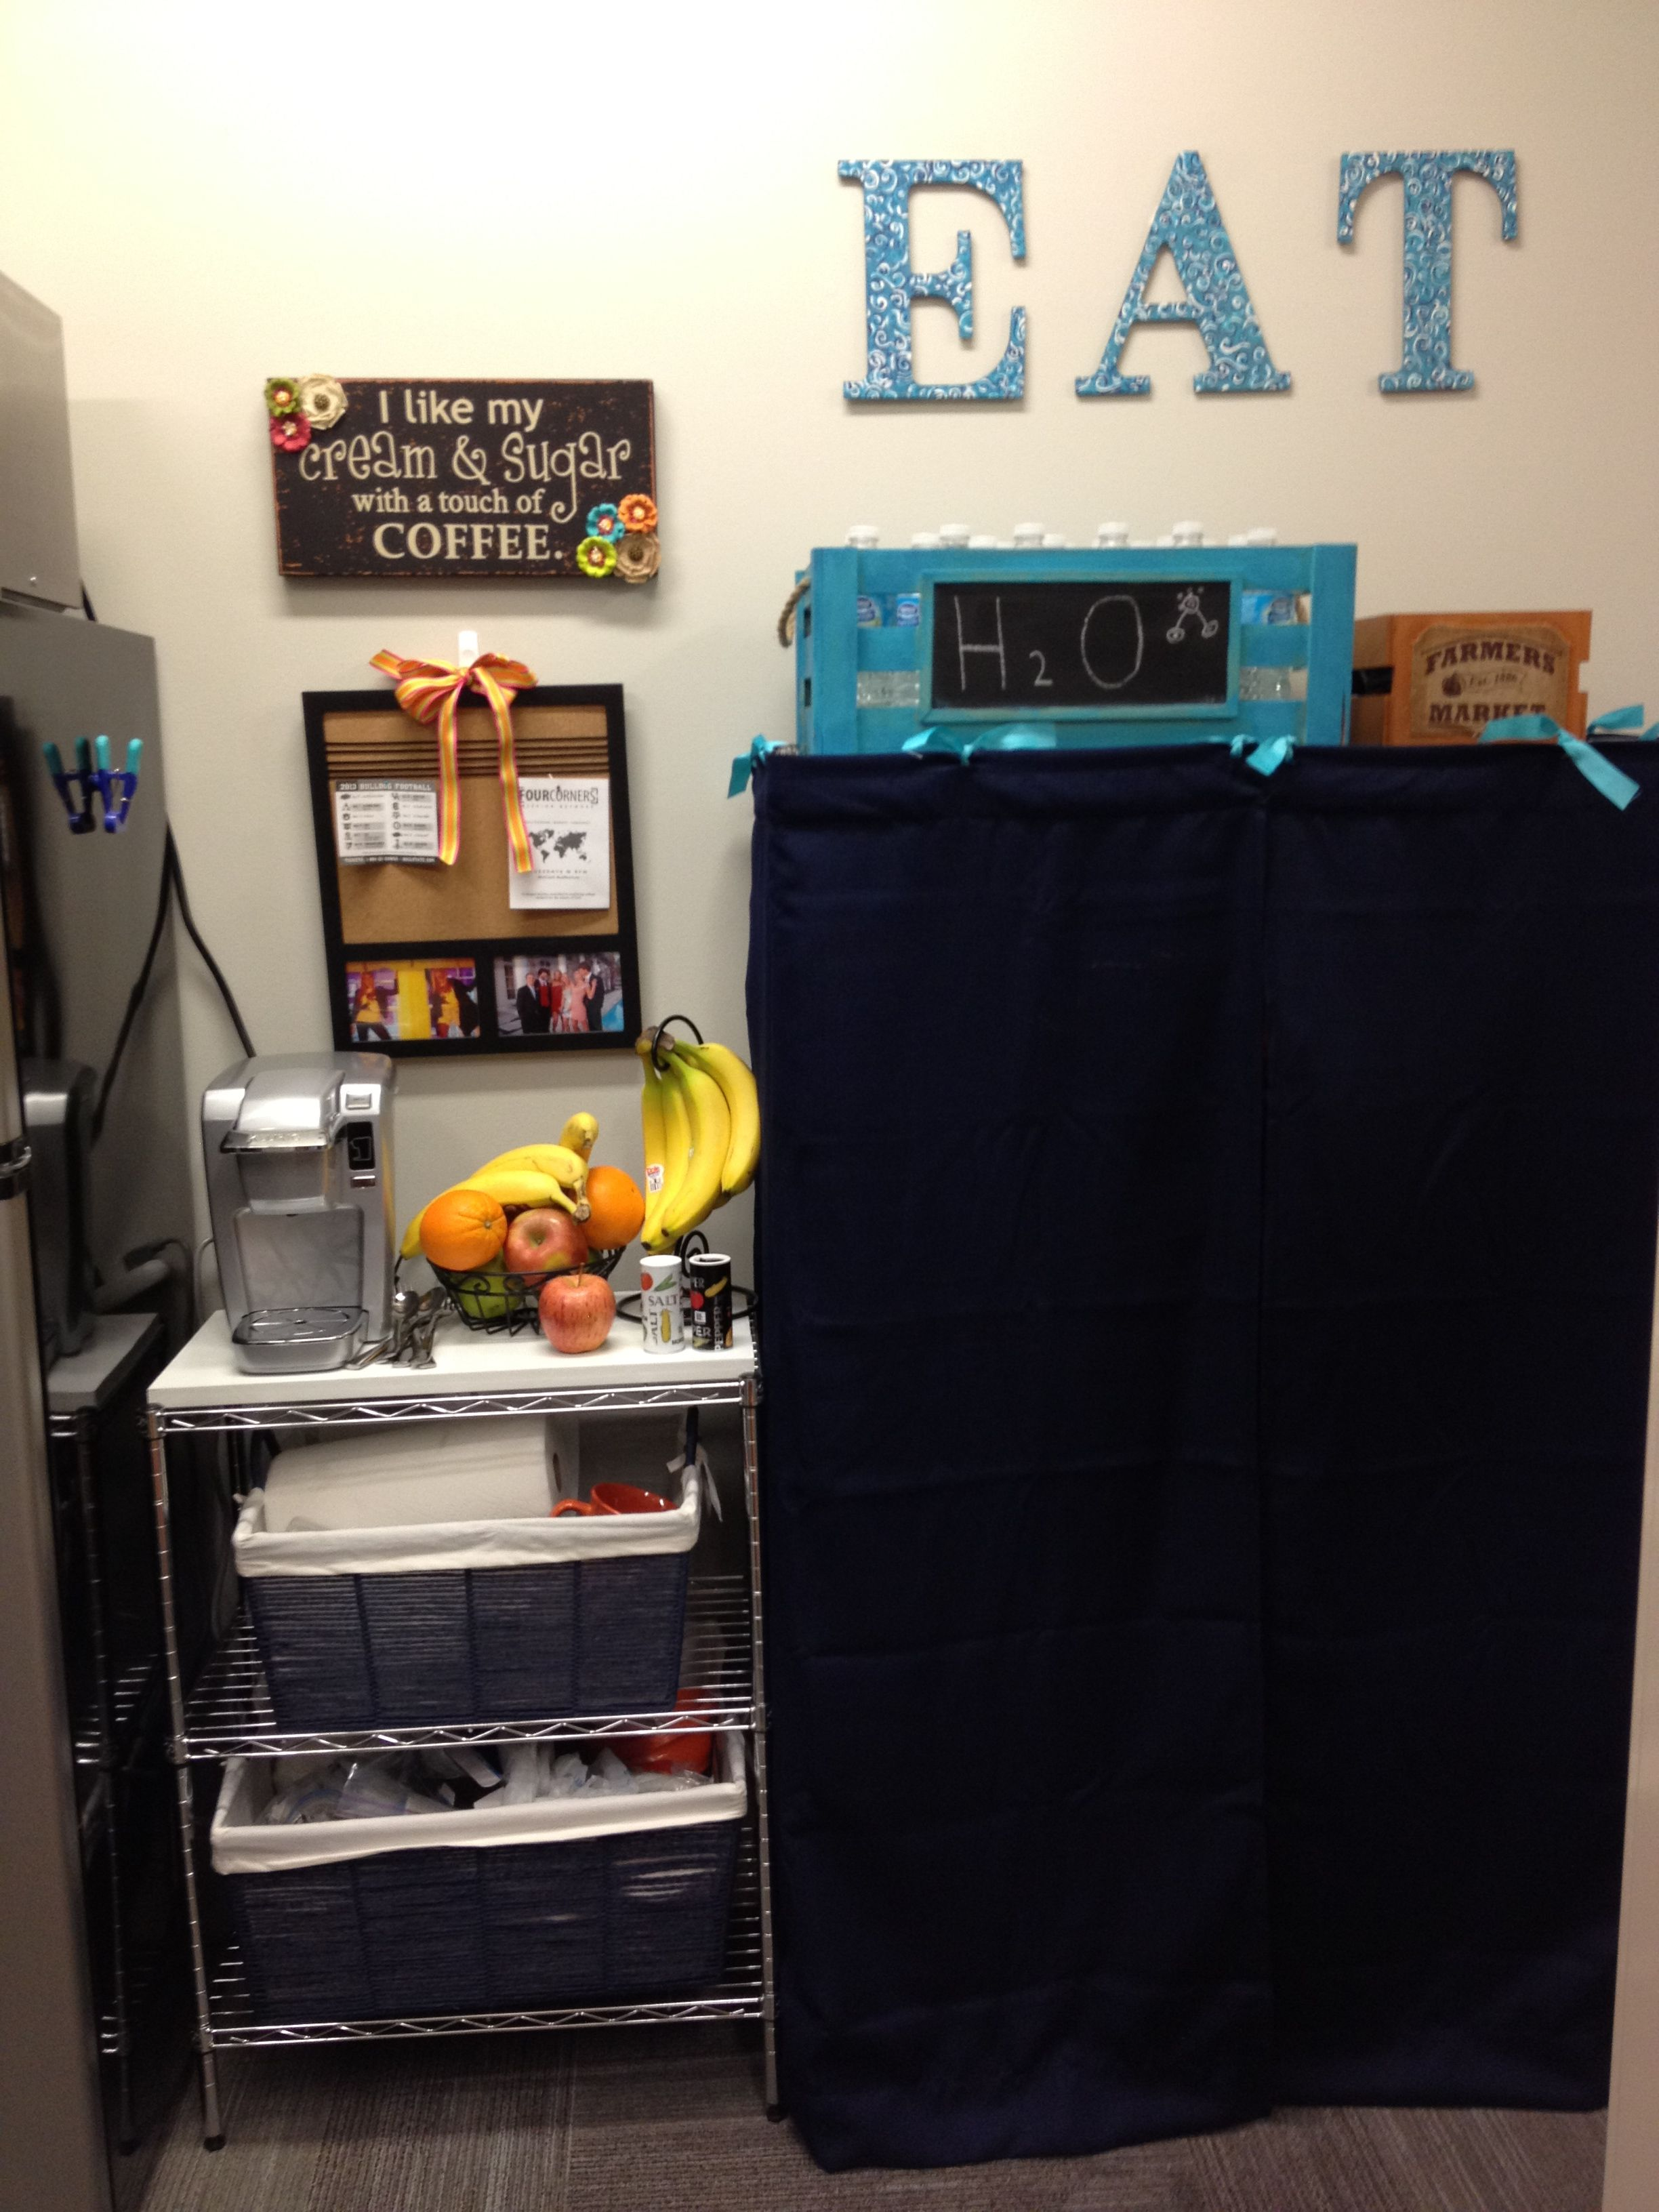 Dorm Room Decor Food Storage Oak Hall Msu College Dorm